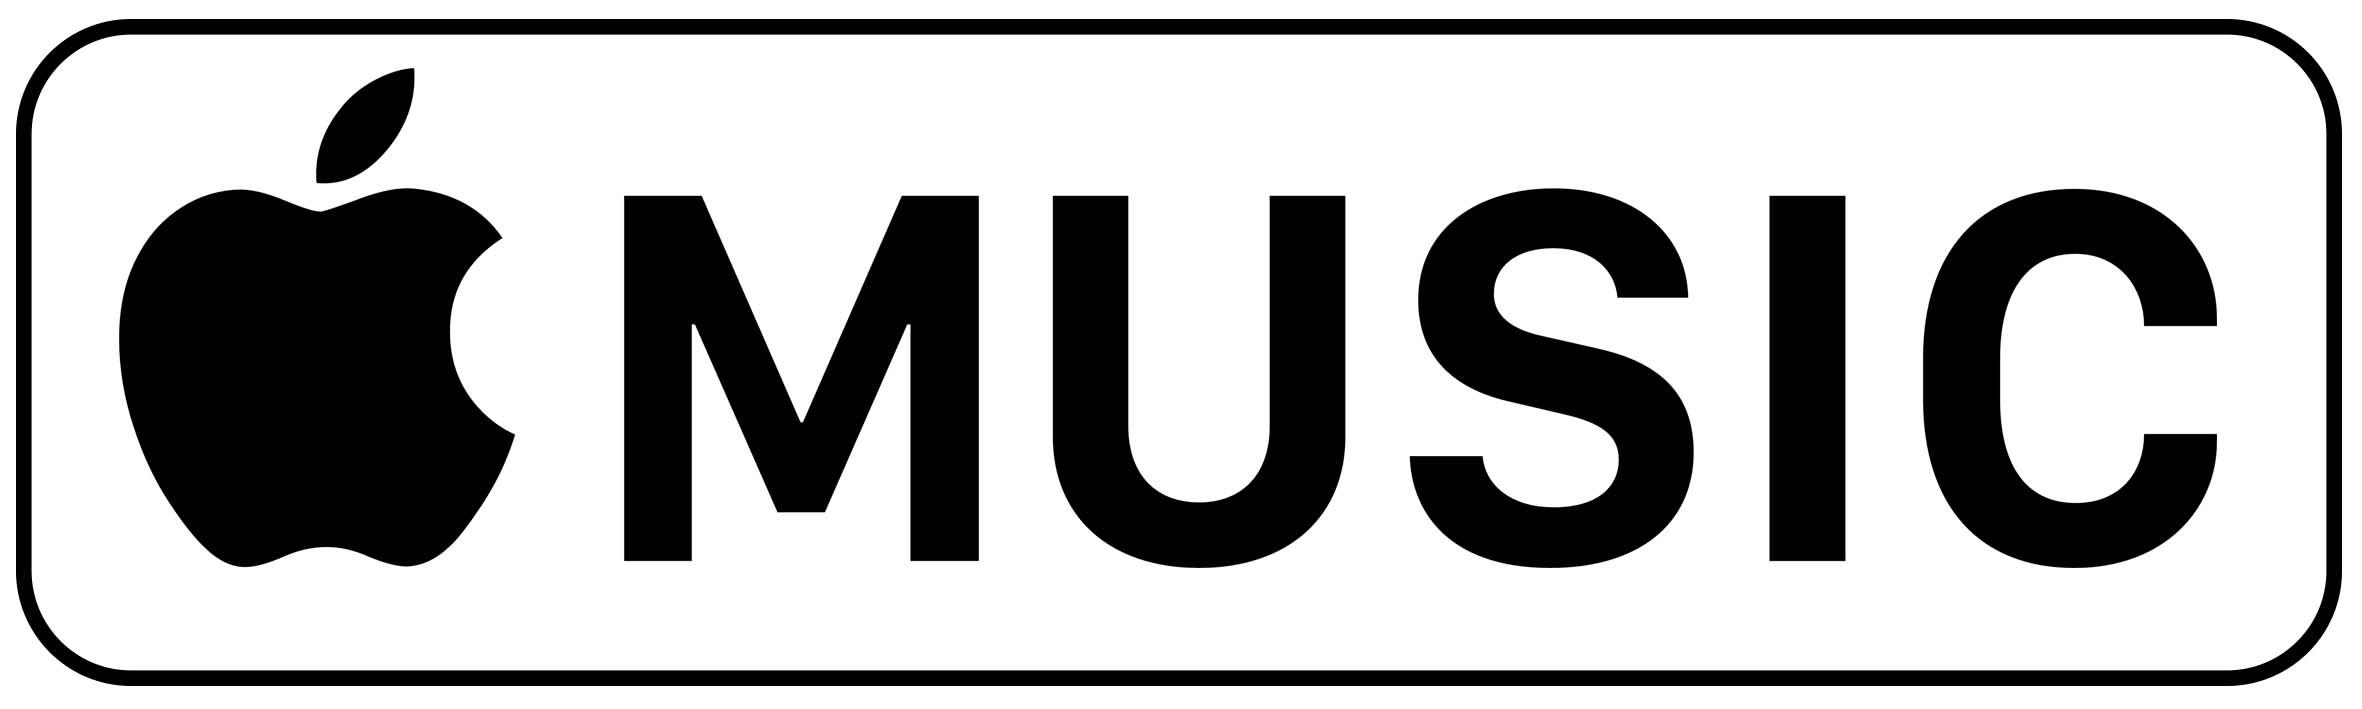 3Apple Music.jpg